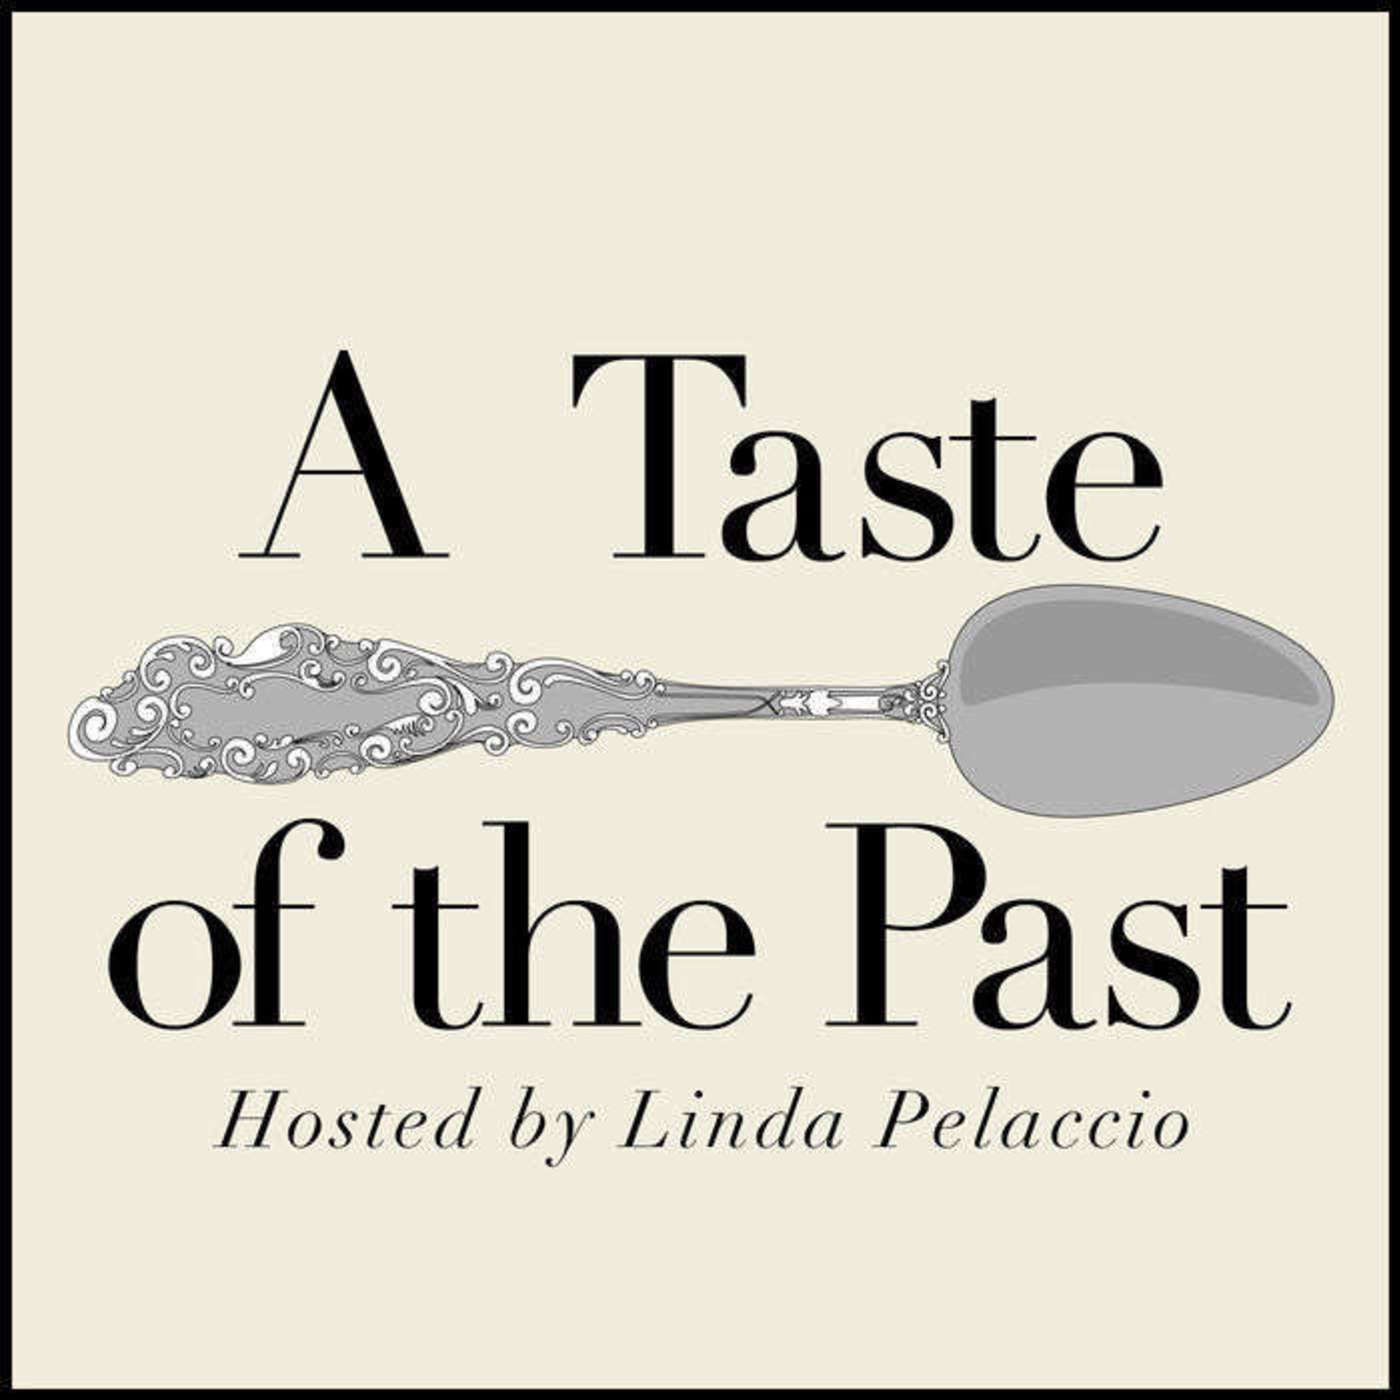 Episode 113: Burmese Cuisine with Naomi Duguid